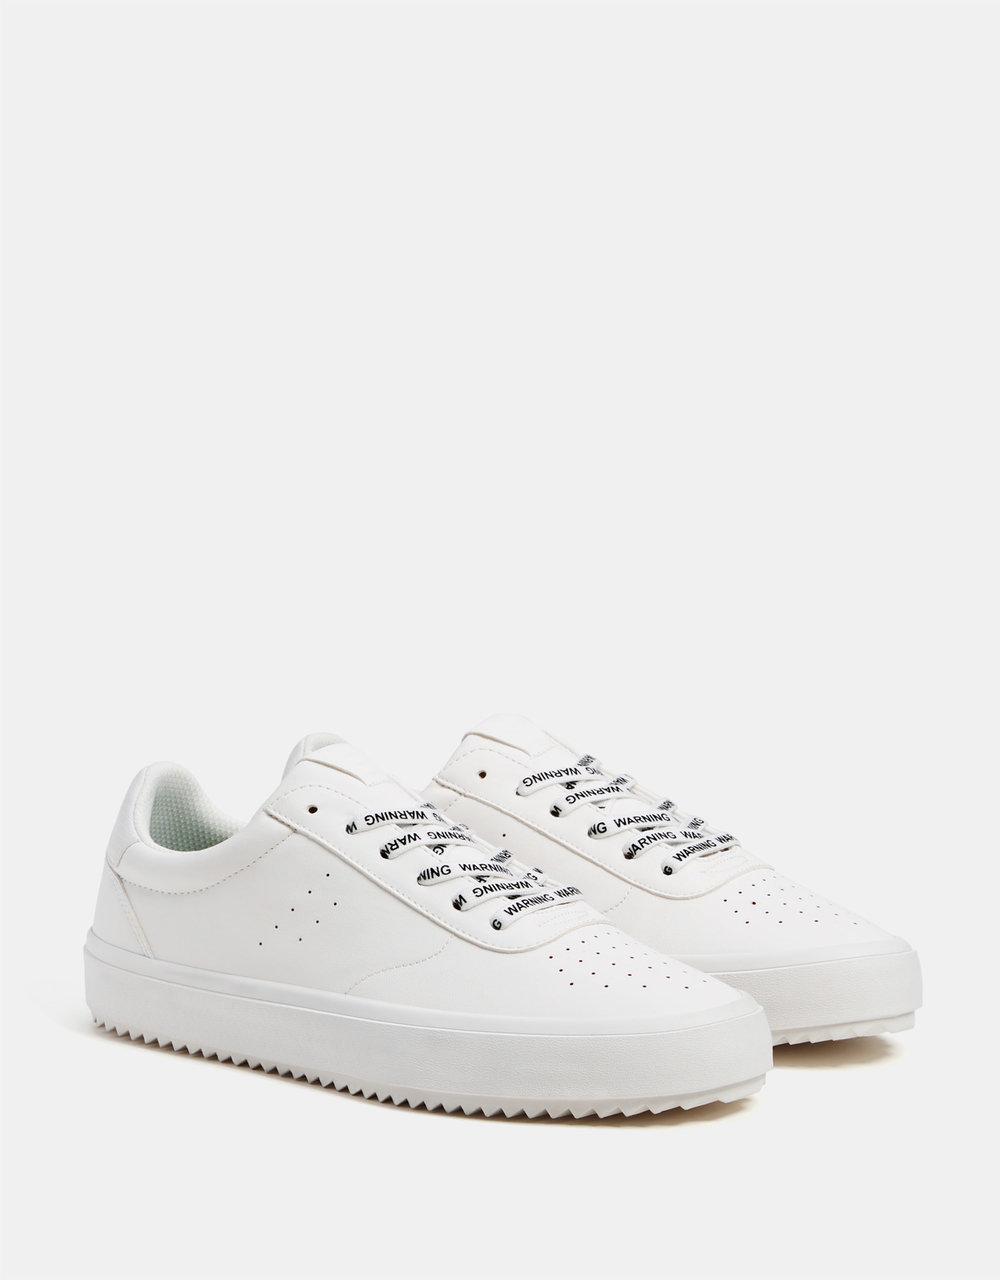 Monochrome Sneakers, £25.99 ( Bershka )